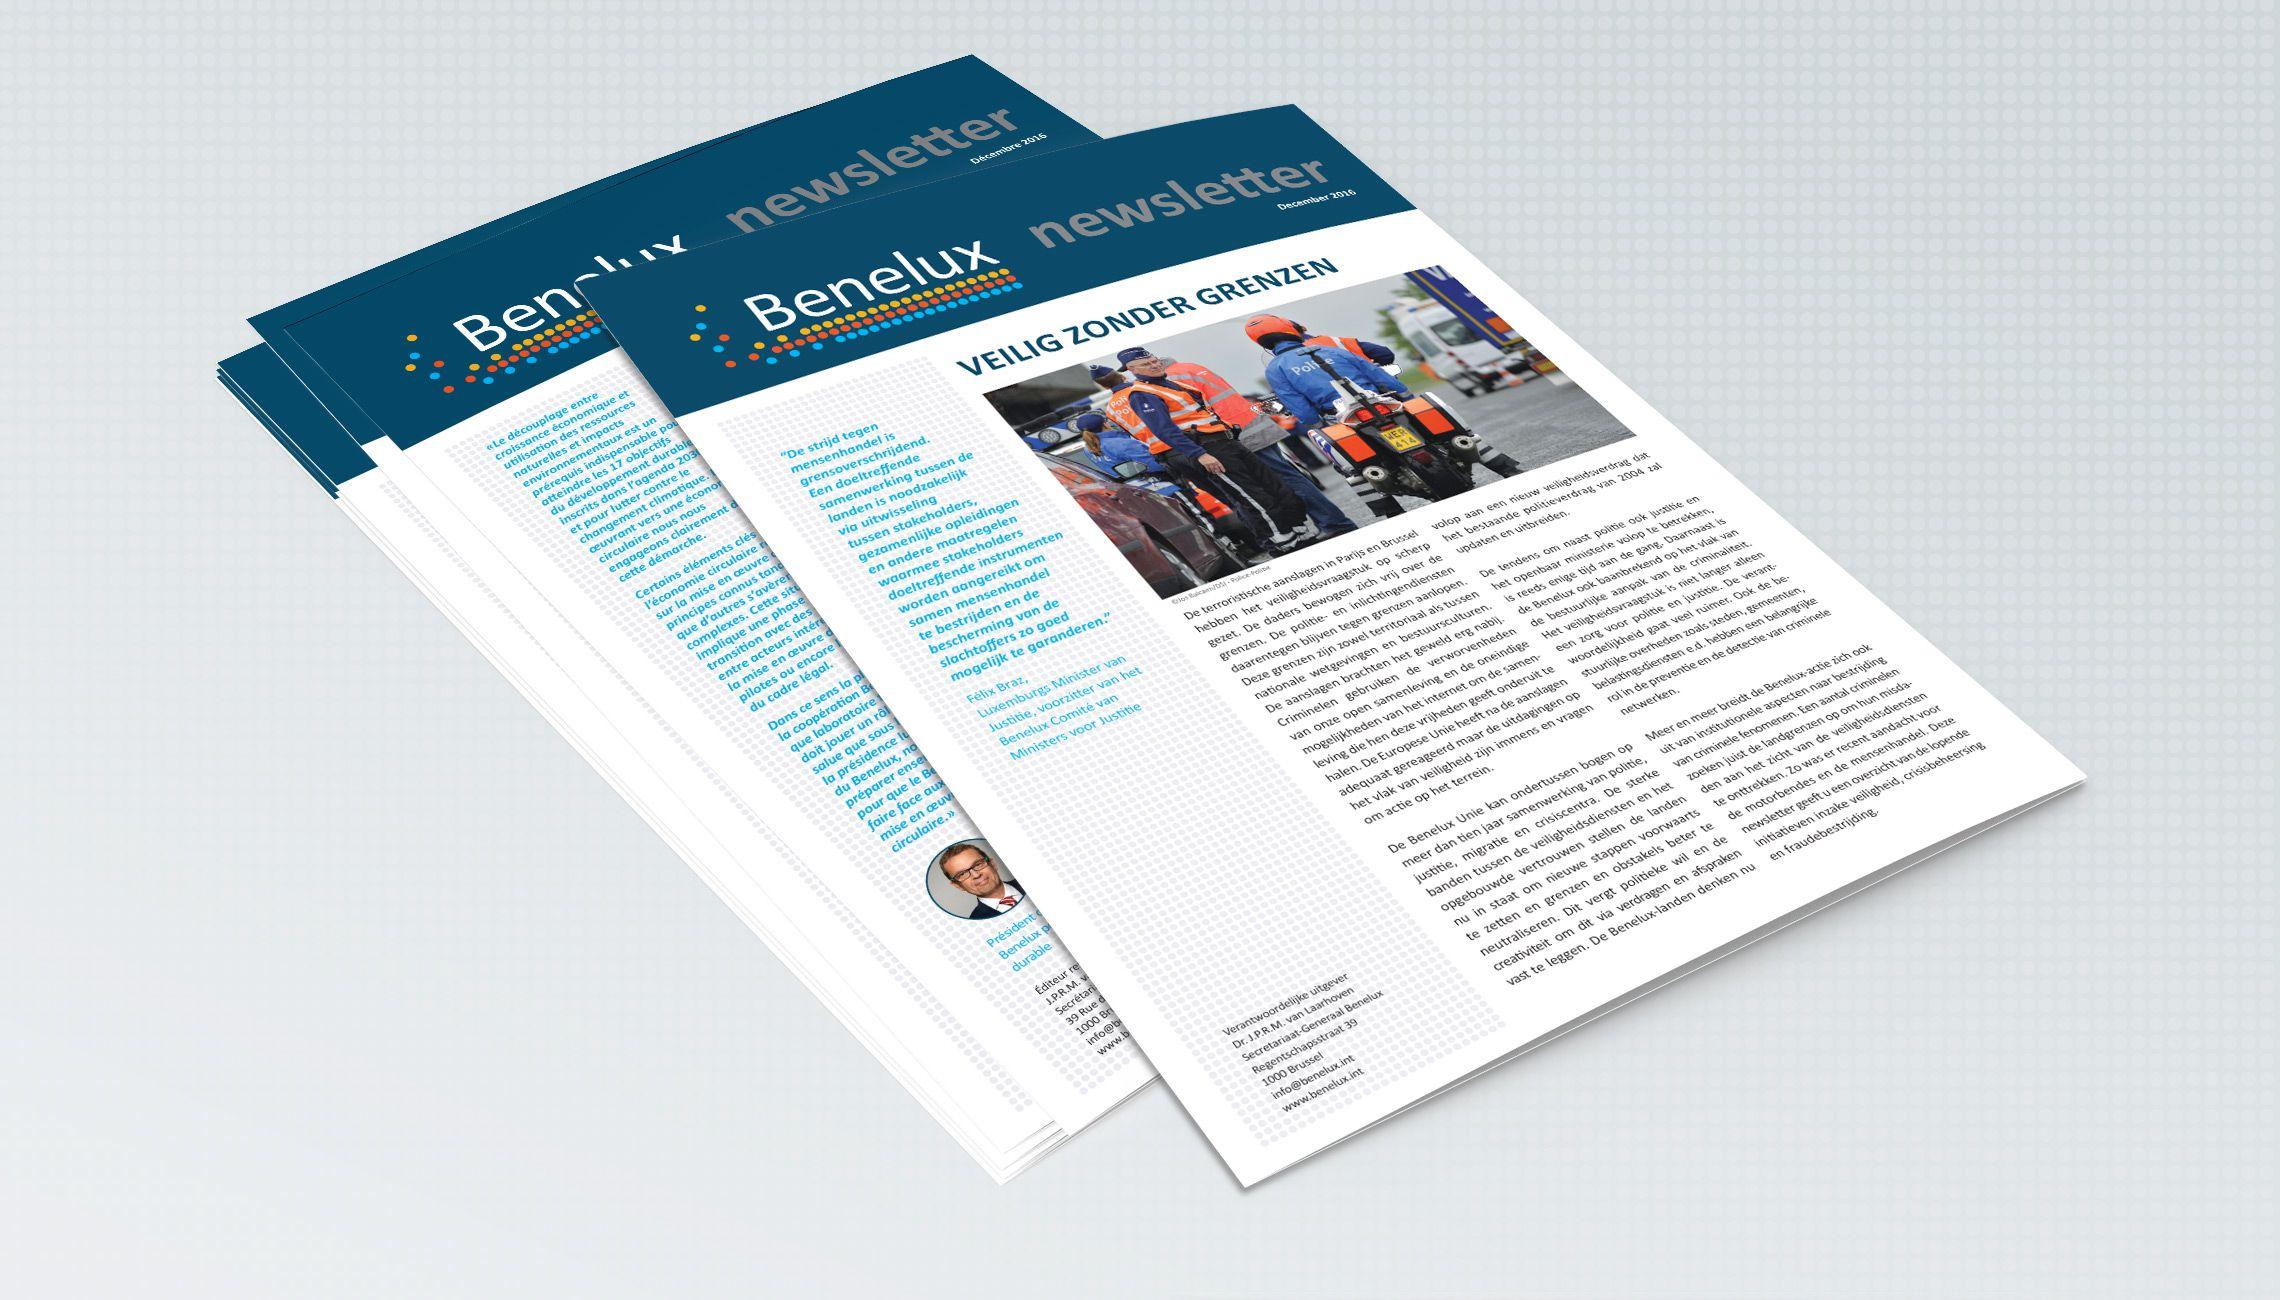 publication: Newsletter Benelux - image 1